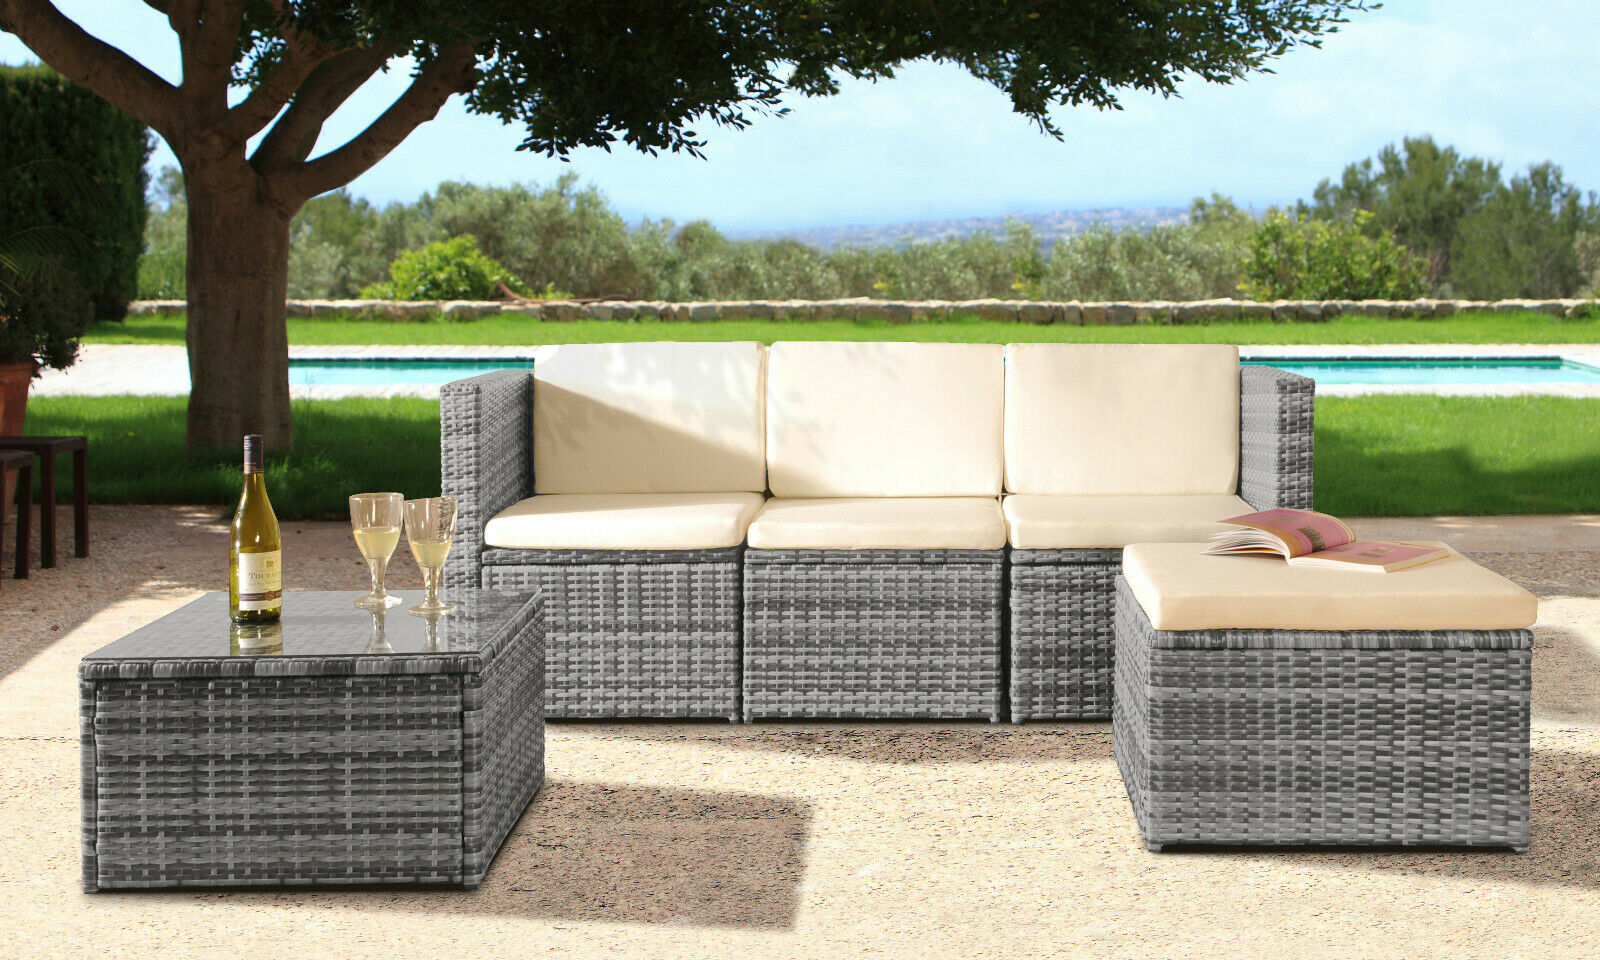 Garden Furniture - 3PC Rattan Garden Patio Furniture Outdoor Set - Sofa, Footstool & Coffee Table